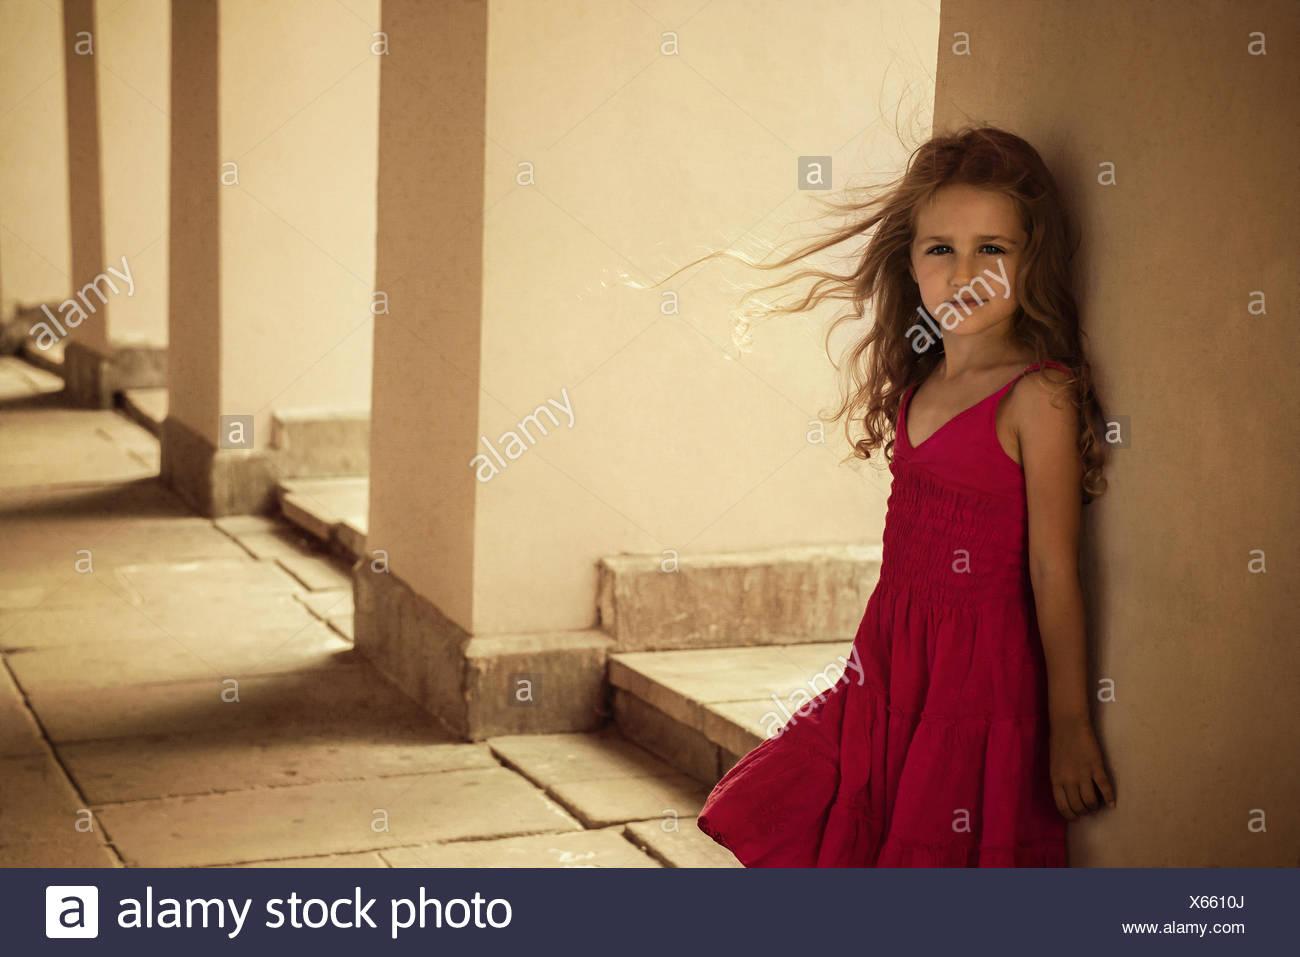 Mädchen (4-5) posiert in roten Kleid Stockbild